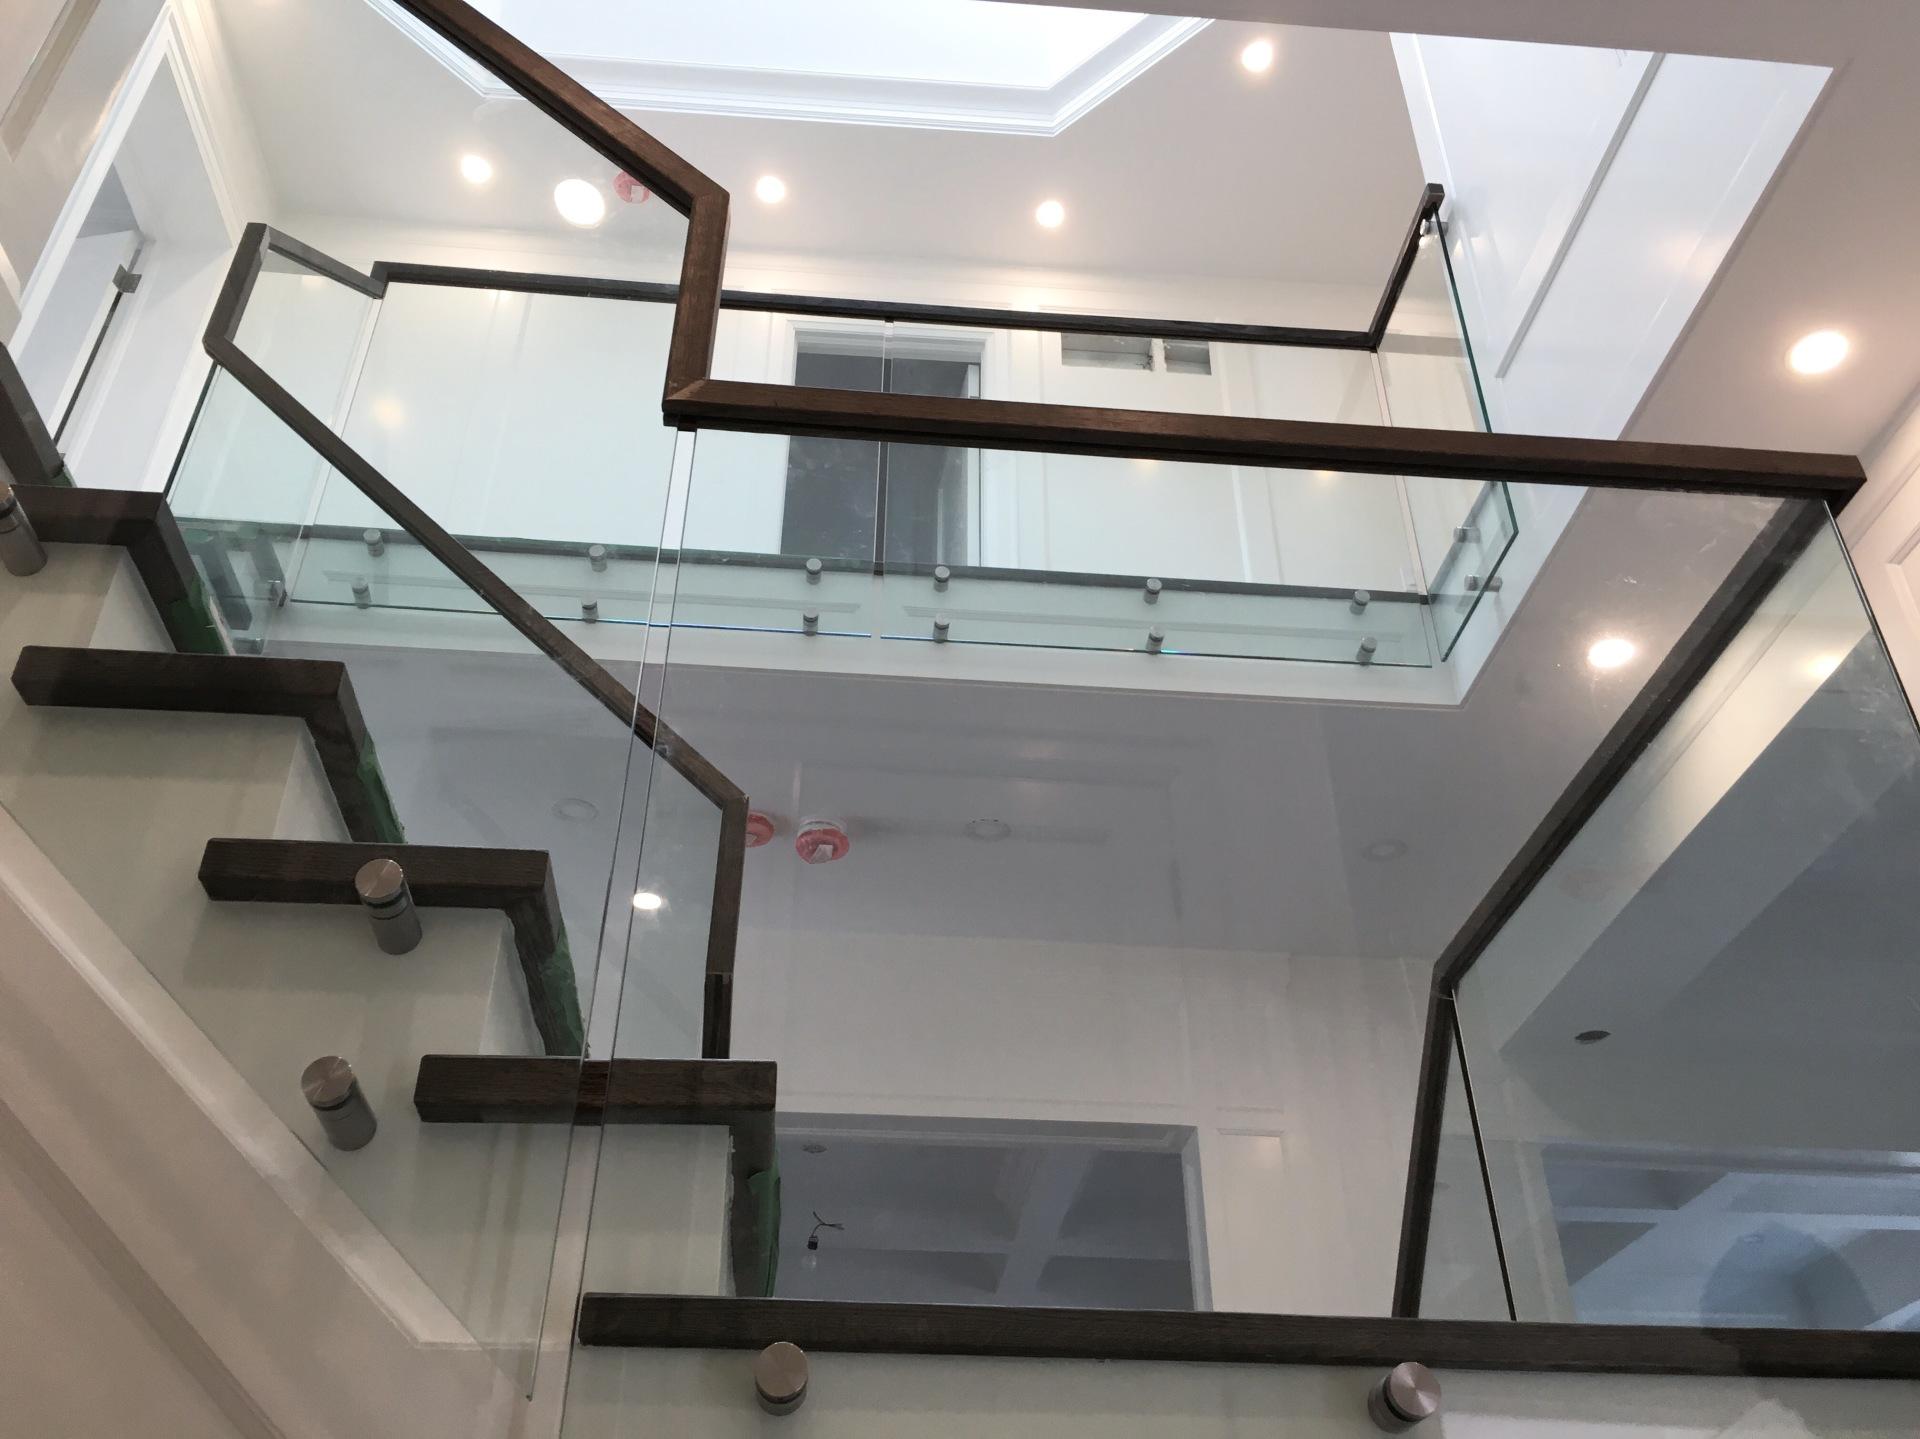 Continous Handrail Glass Railings